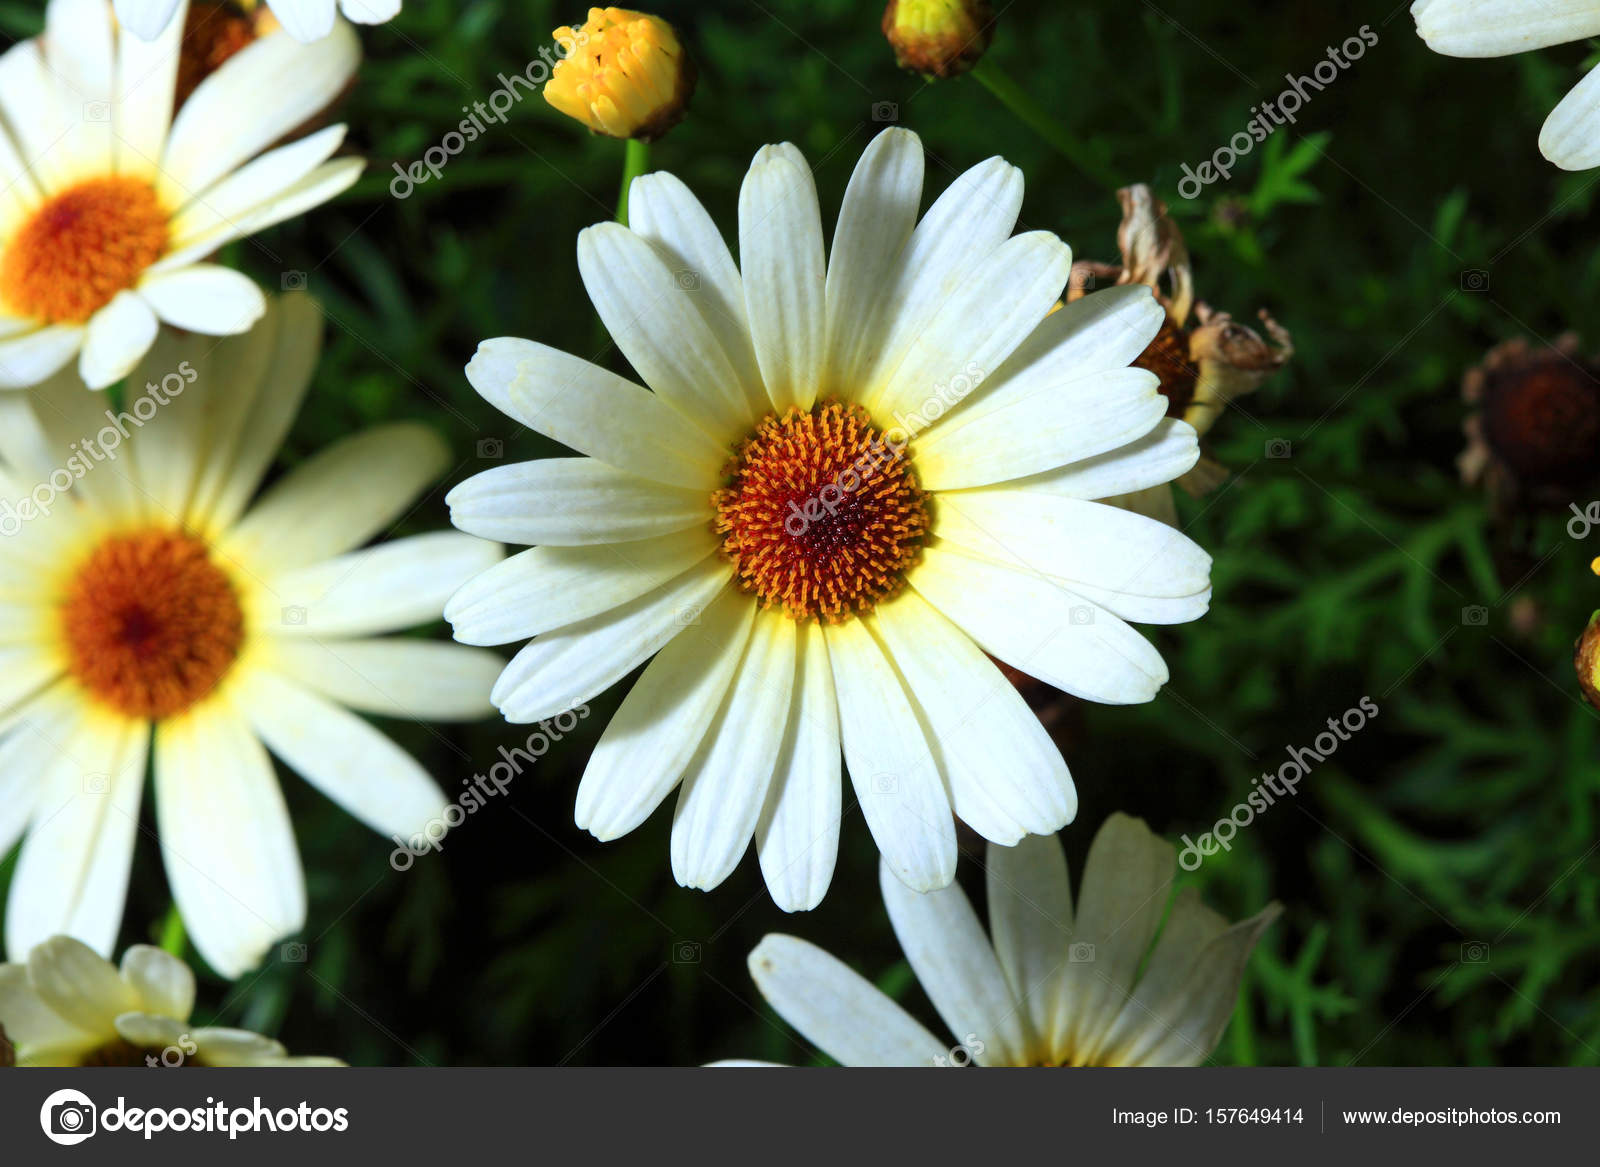 Beautiful daisy flowers stock photo topphoto 157649414 beautiful daisy flowers close up photo by topphoto izmirmasajfo